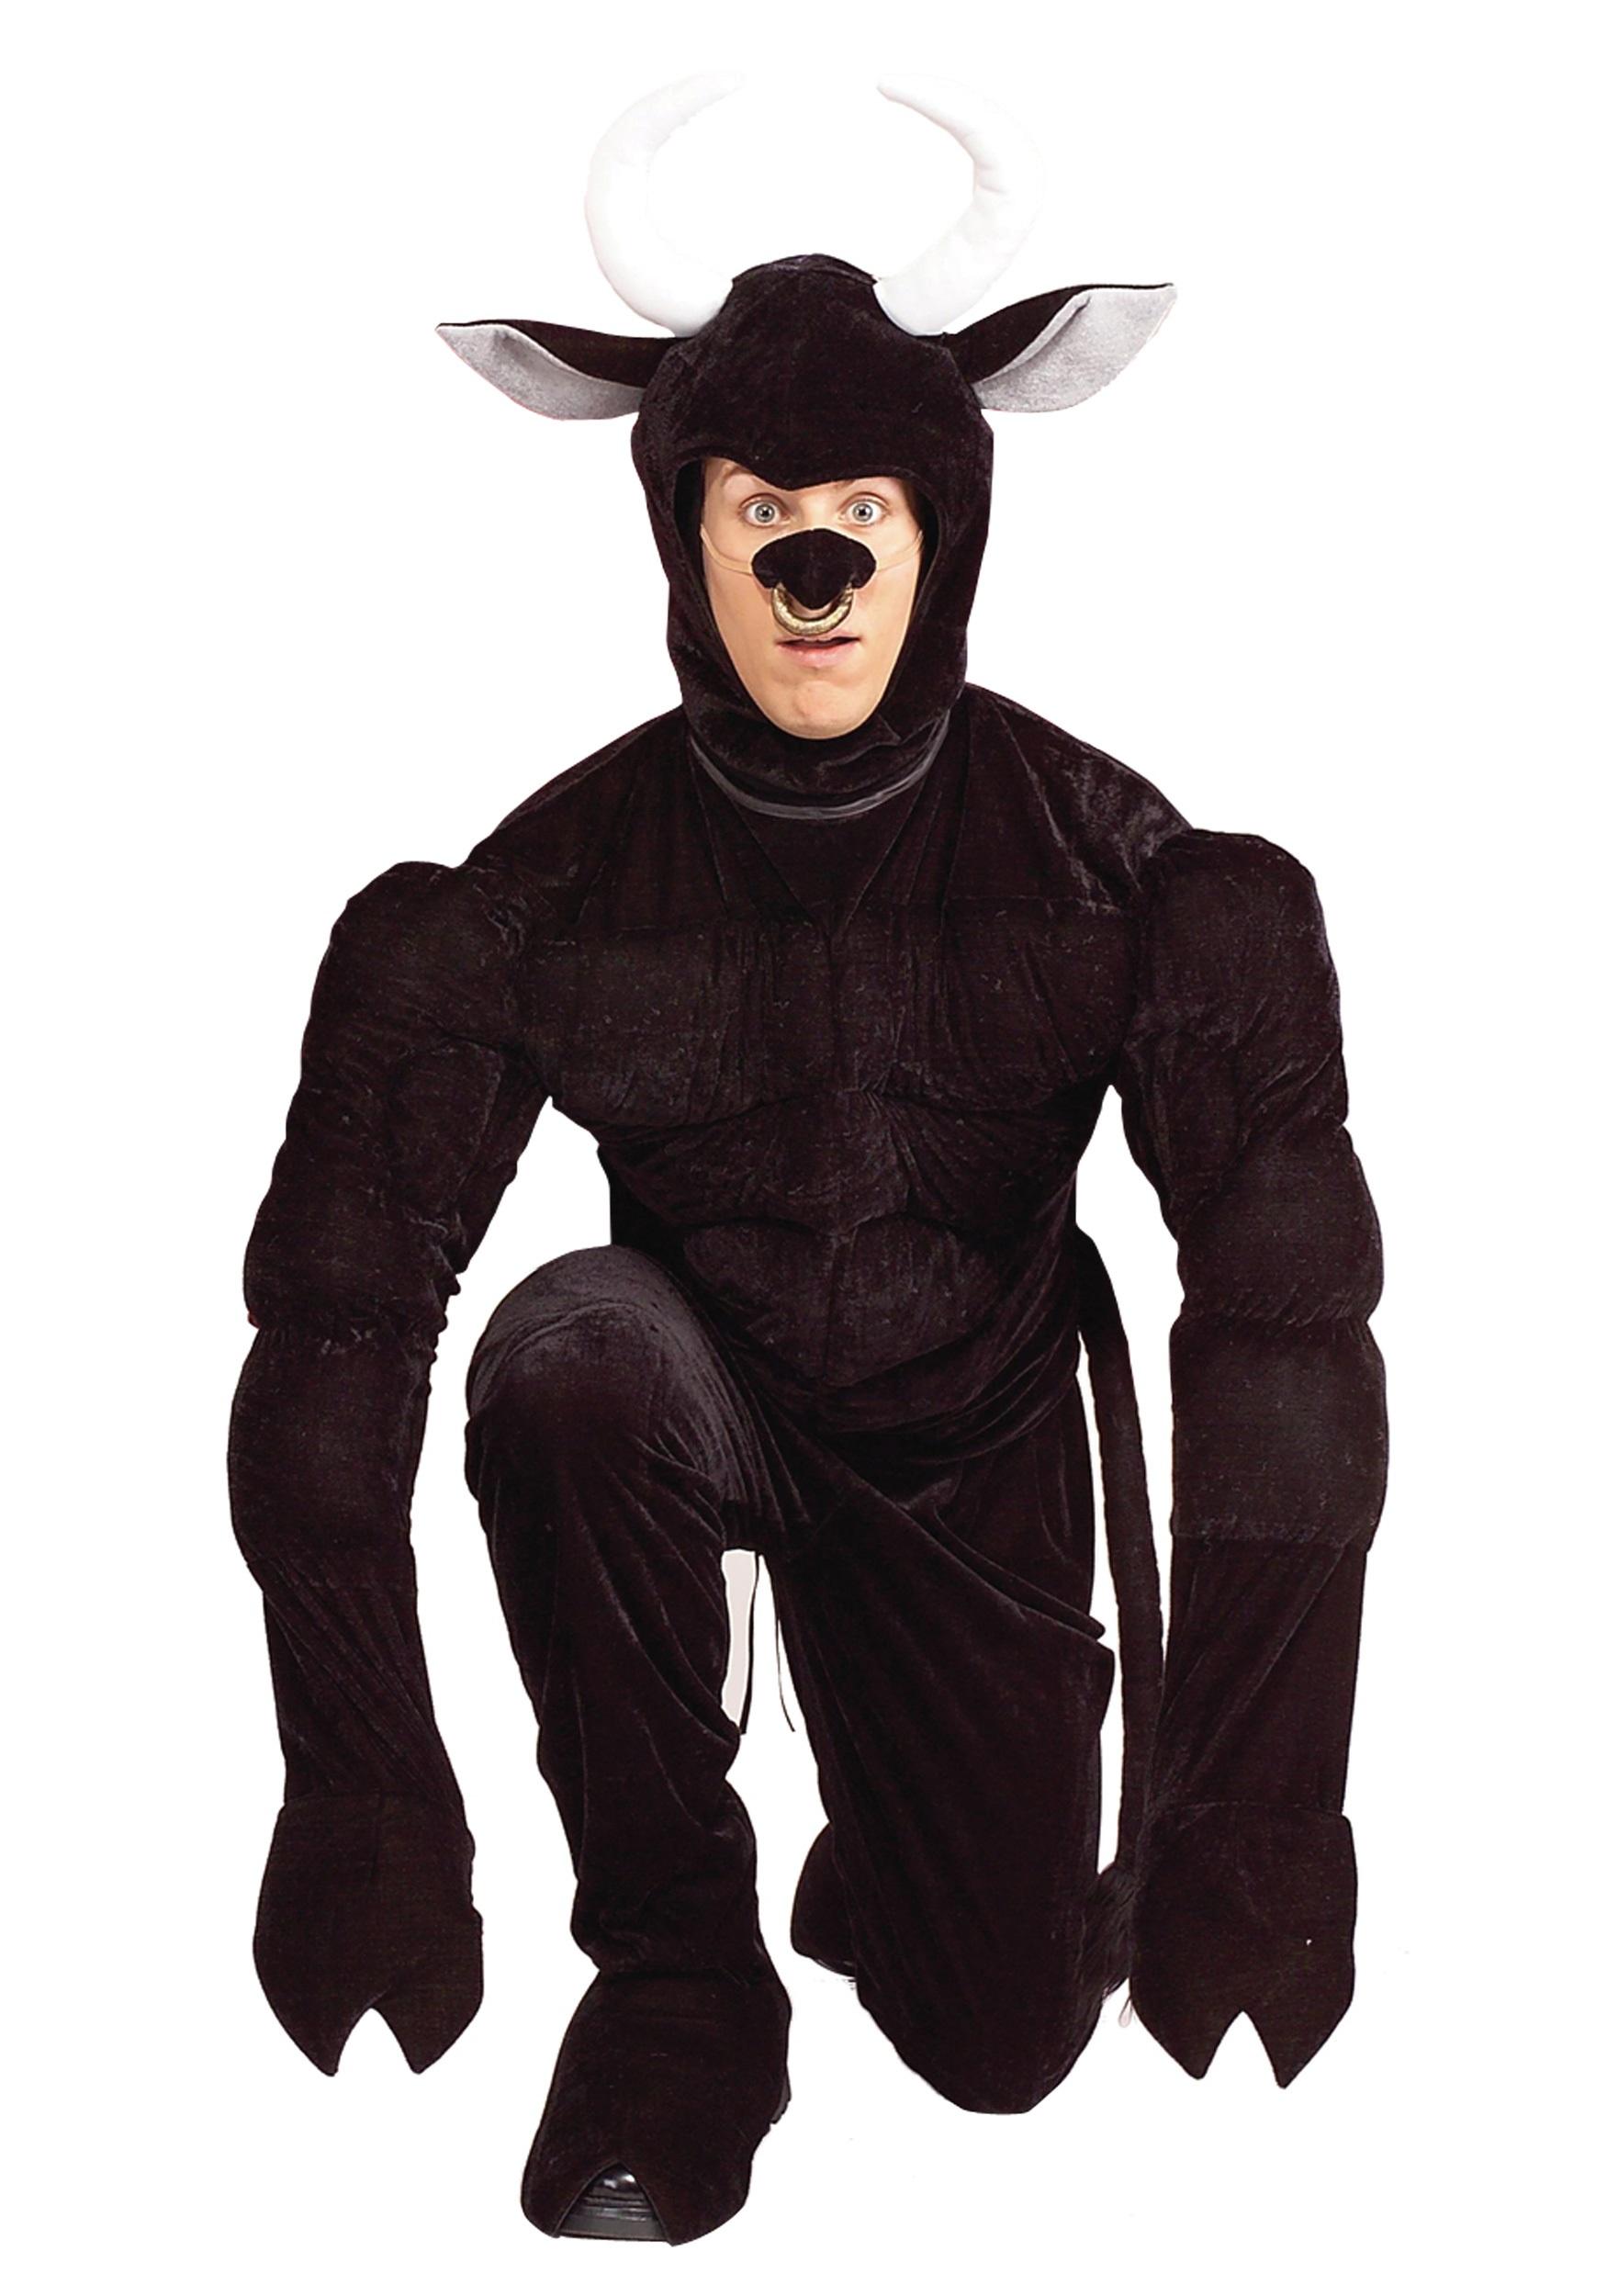 Adult Black Bull Costume  sc 1 st  Costumes Galore & Adult Black Bull Costume - Matador Costume Ideas